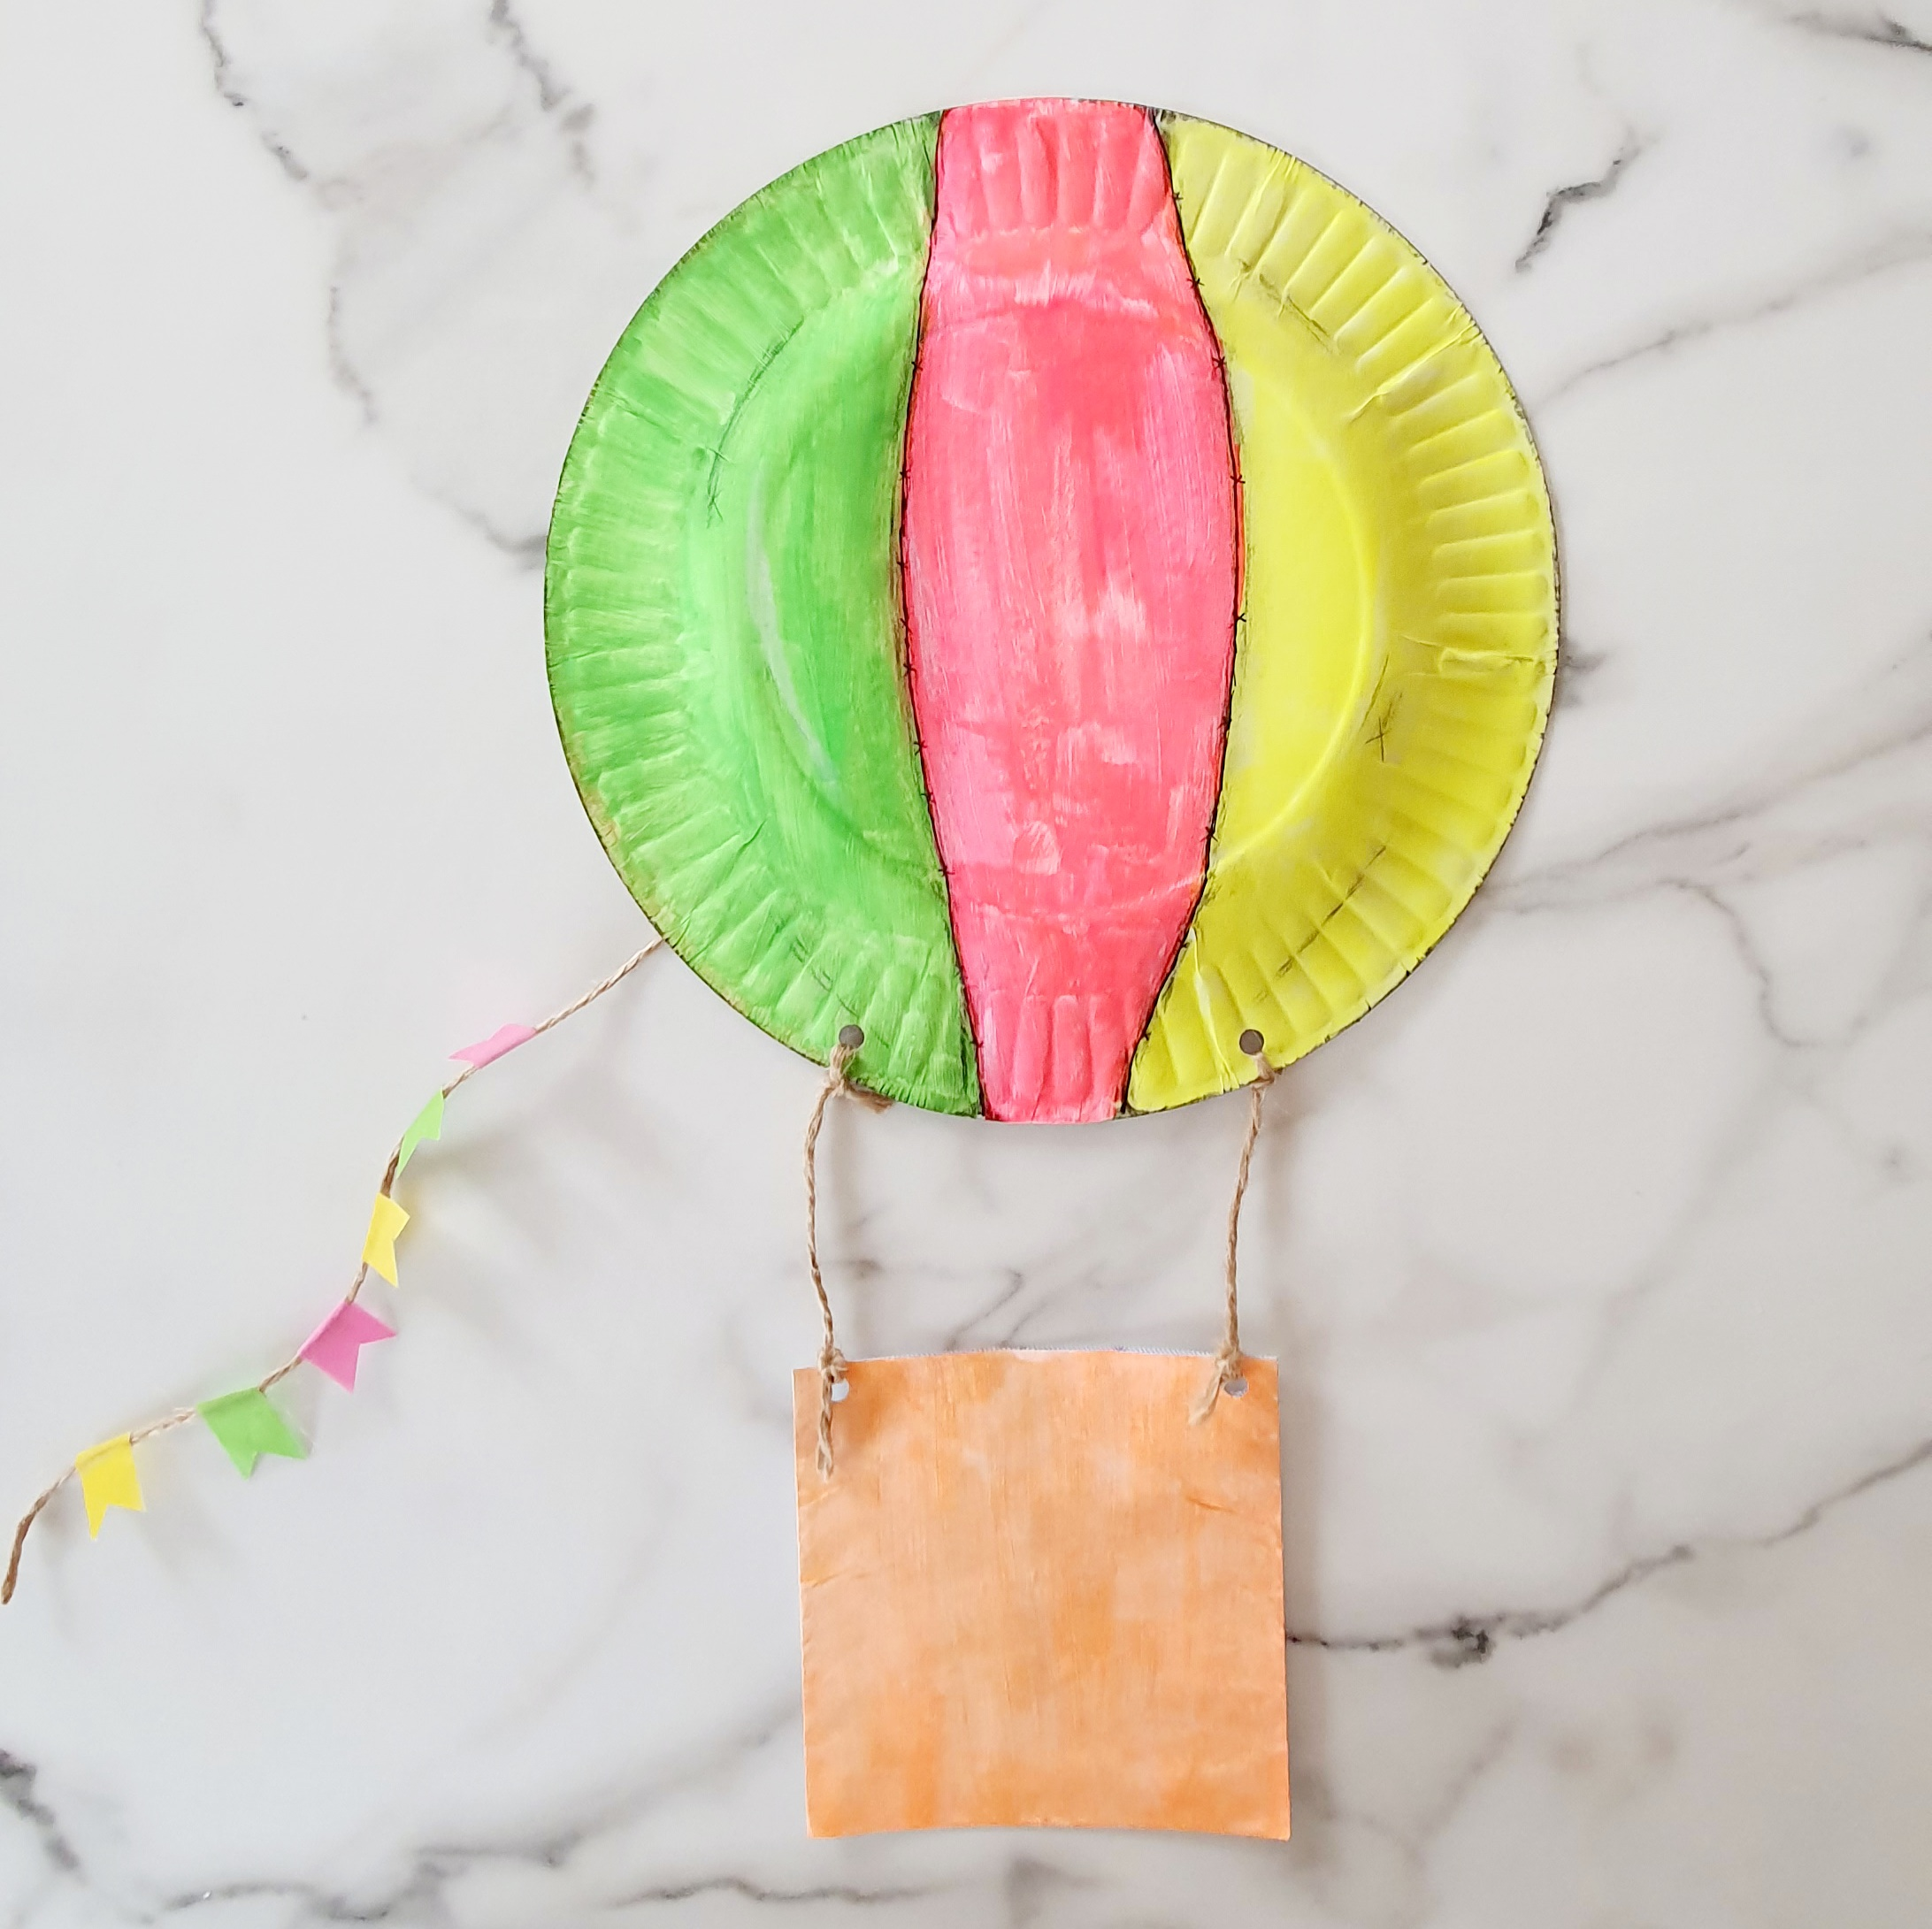 Hot Air Balloon Craft | A Few Small Adventures